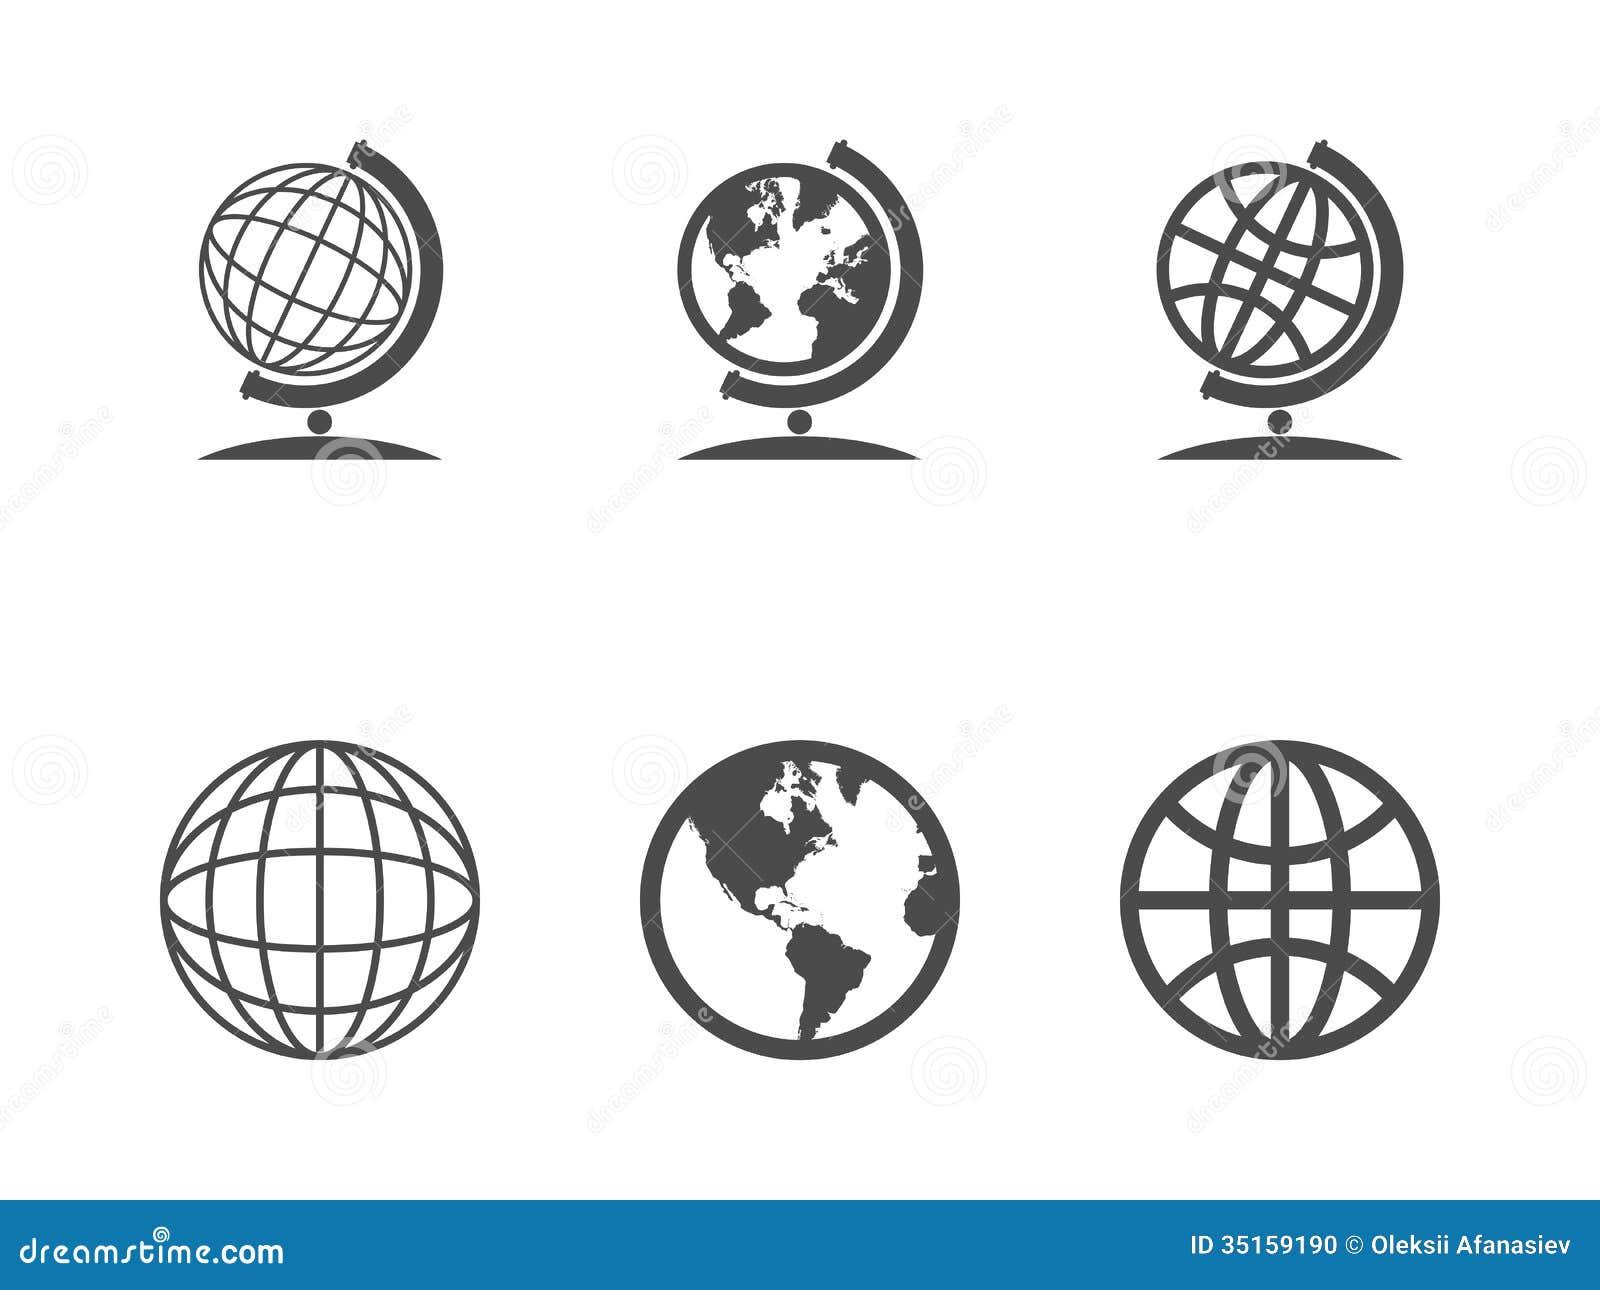 Globe icons stock vector illustration of computer europe 35159190 globe icons publicscrutiny Choice Image